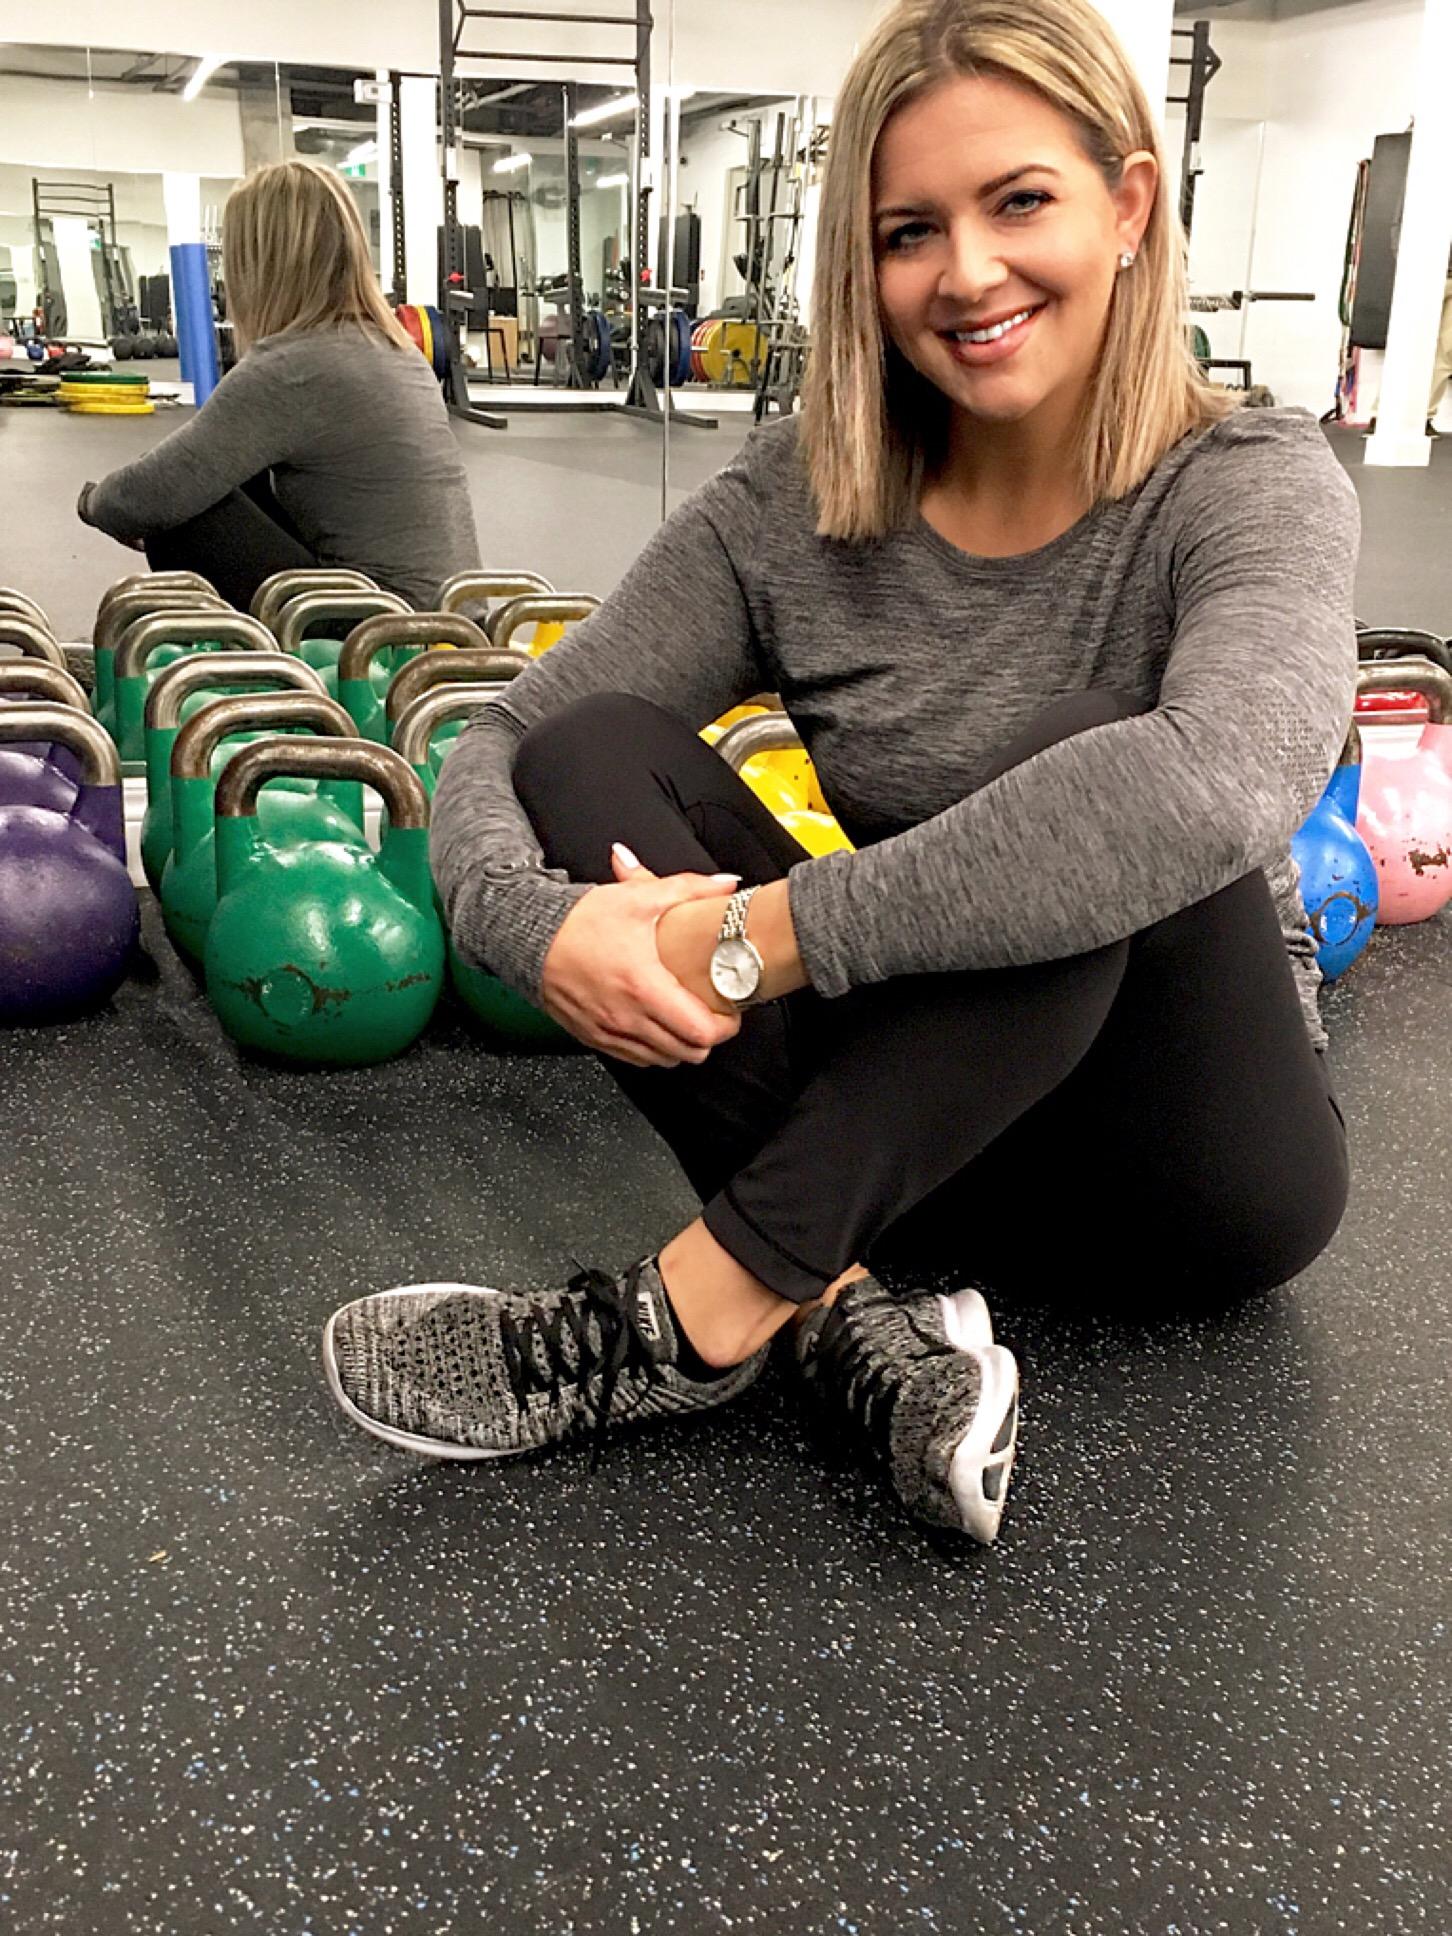 Angela Furfaro, Personal Trainer